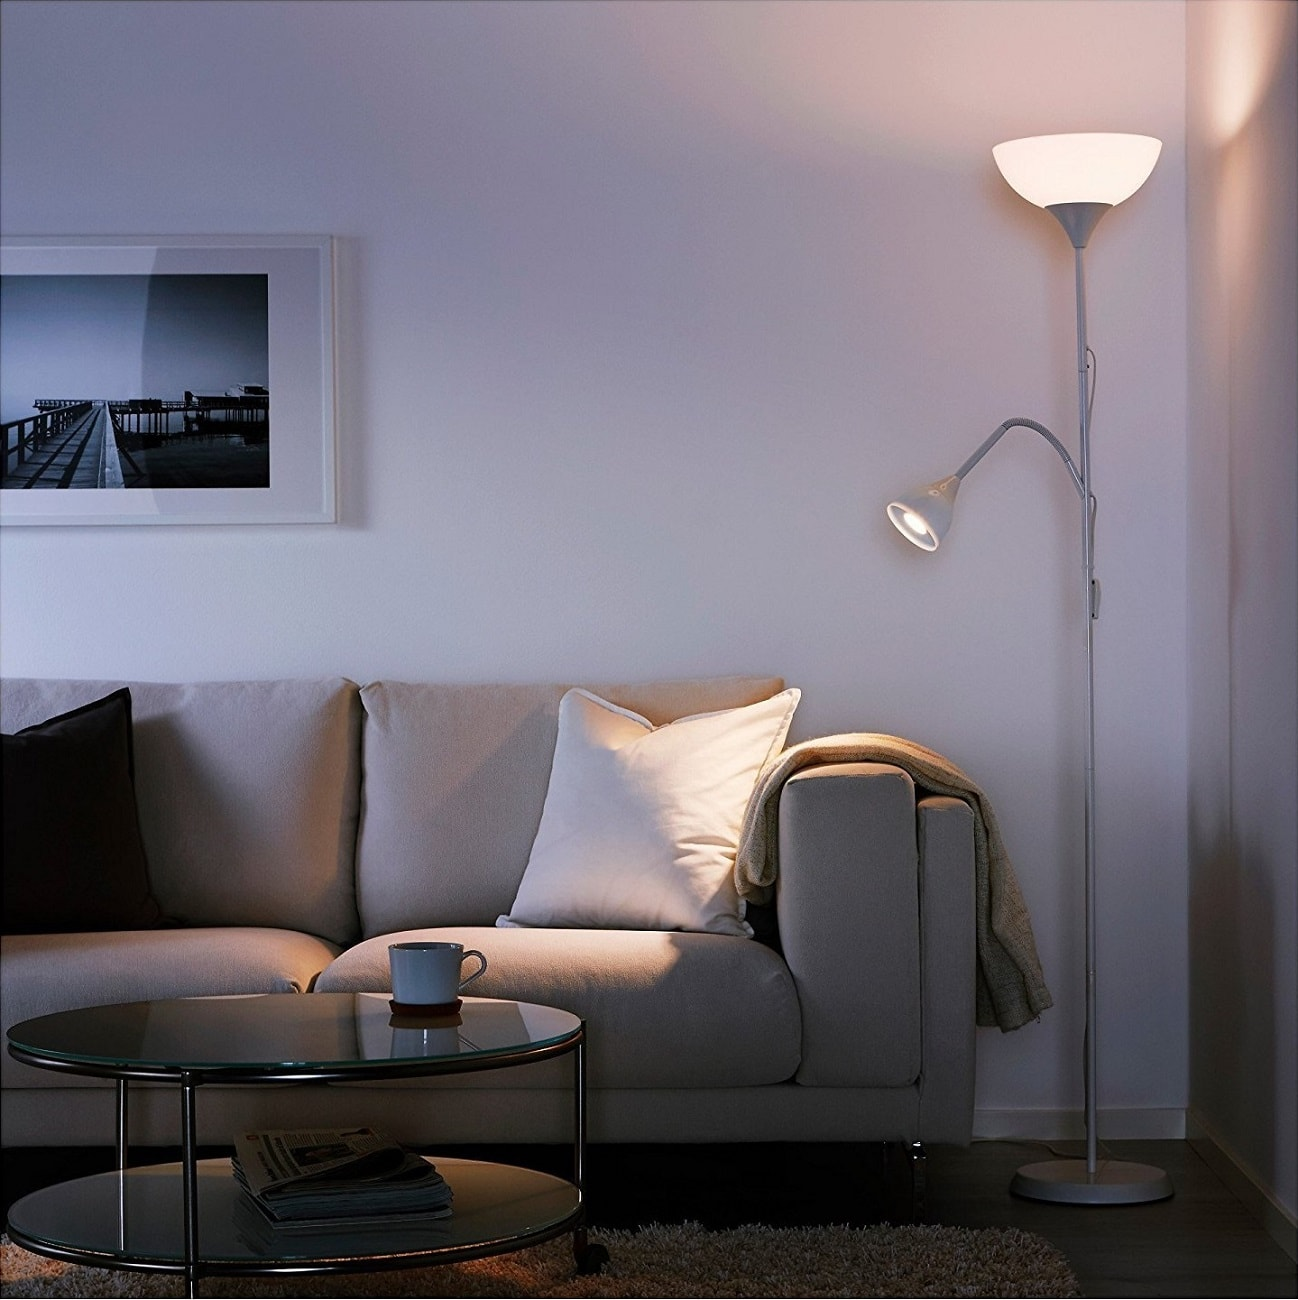 Lampada piantana 176 cm con lampada da lettura ikea lgv for Lampada da lettura ikea